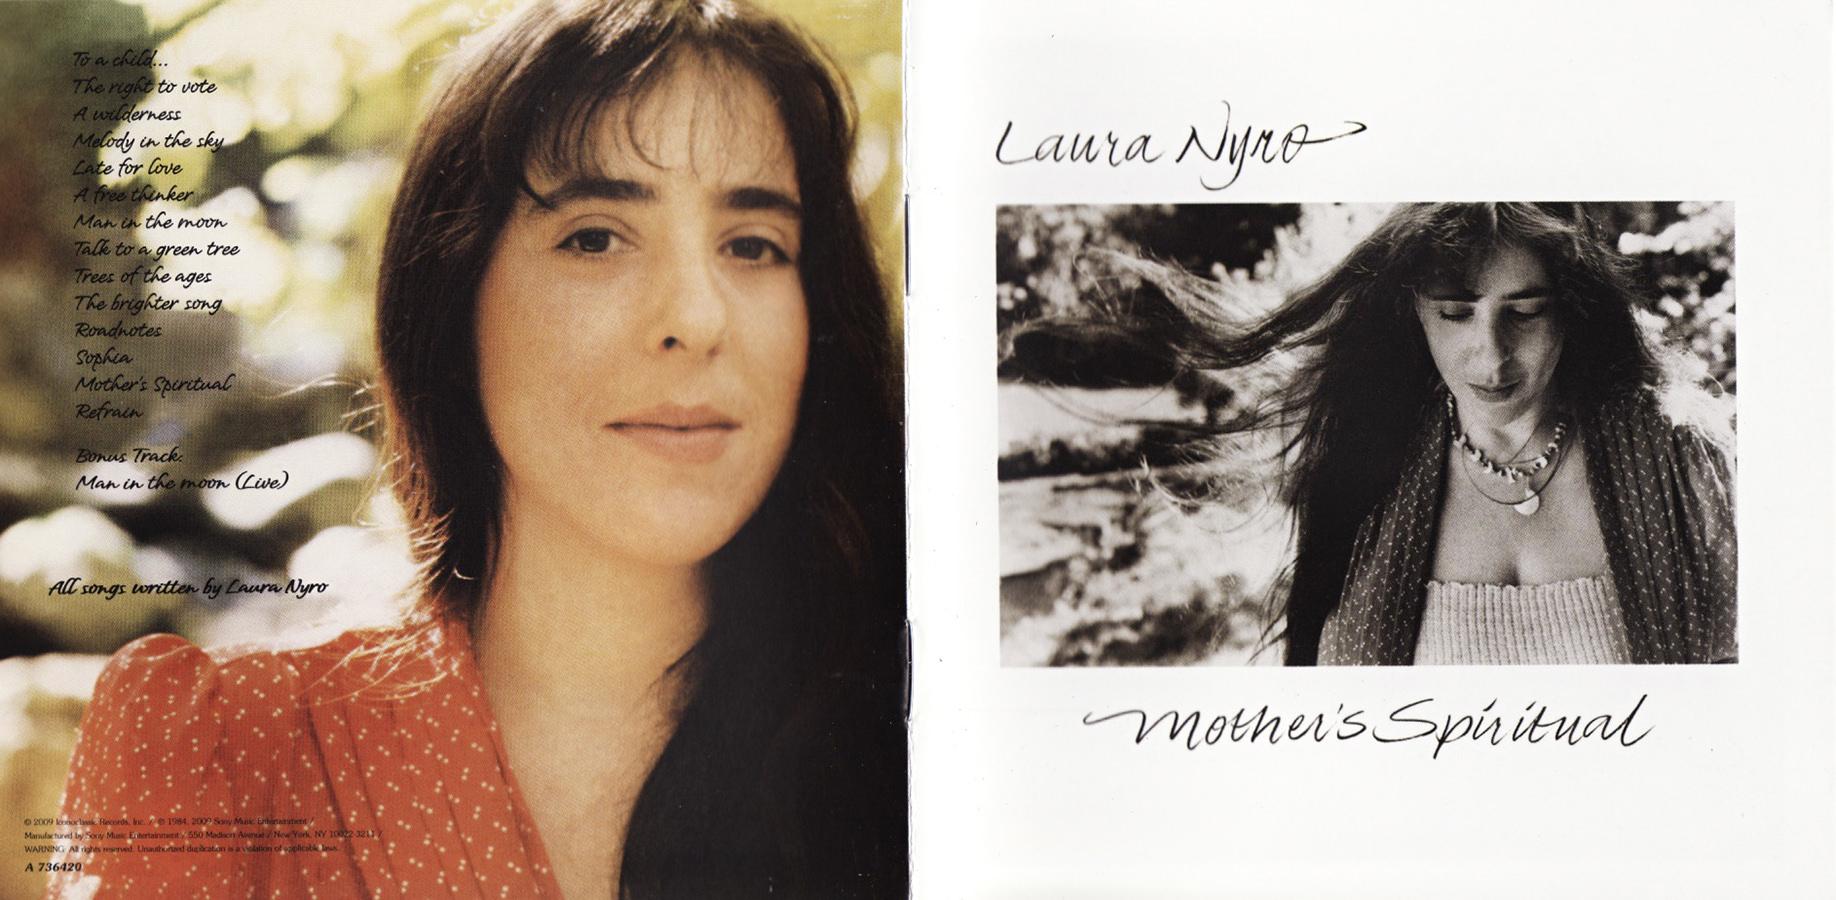 Laura Nyro, Mother's Spiritual